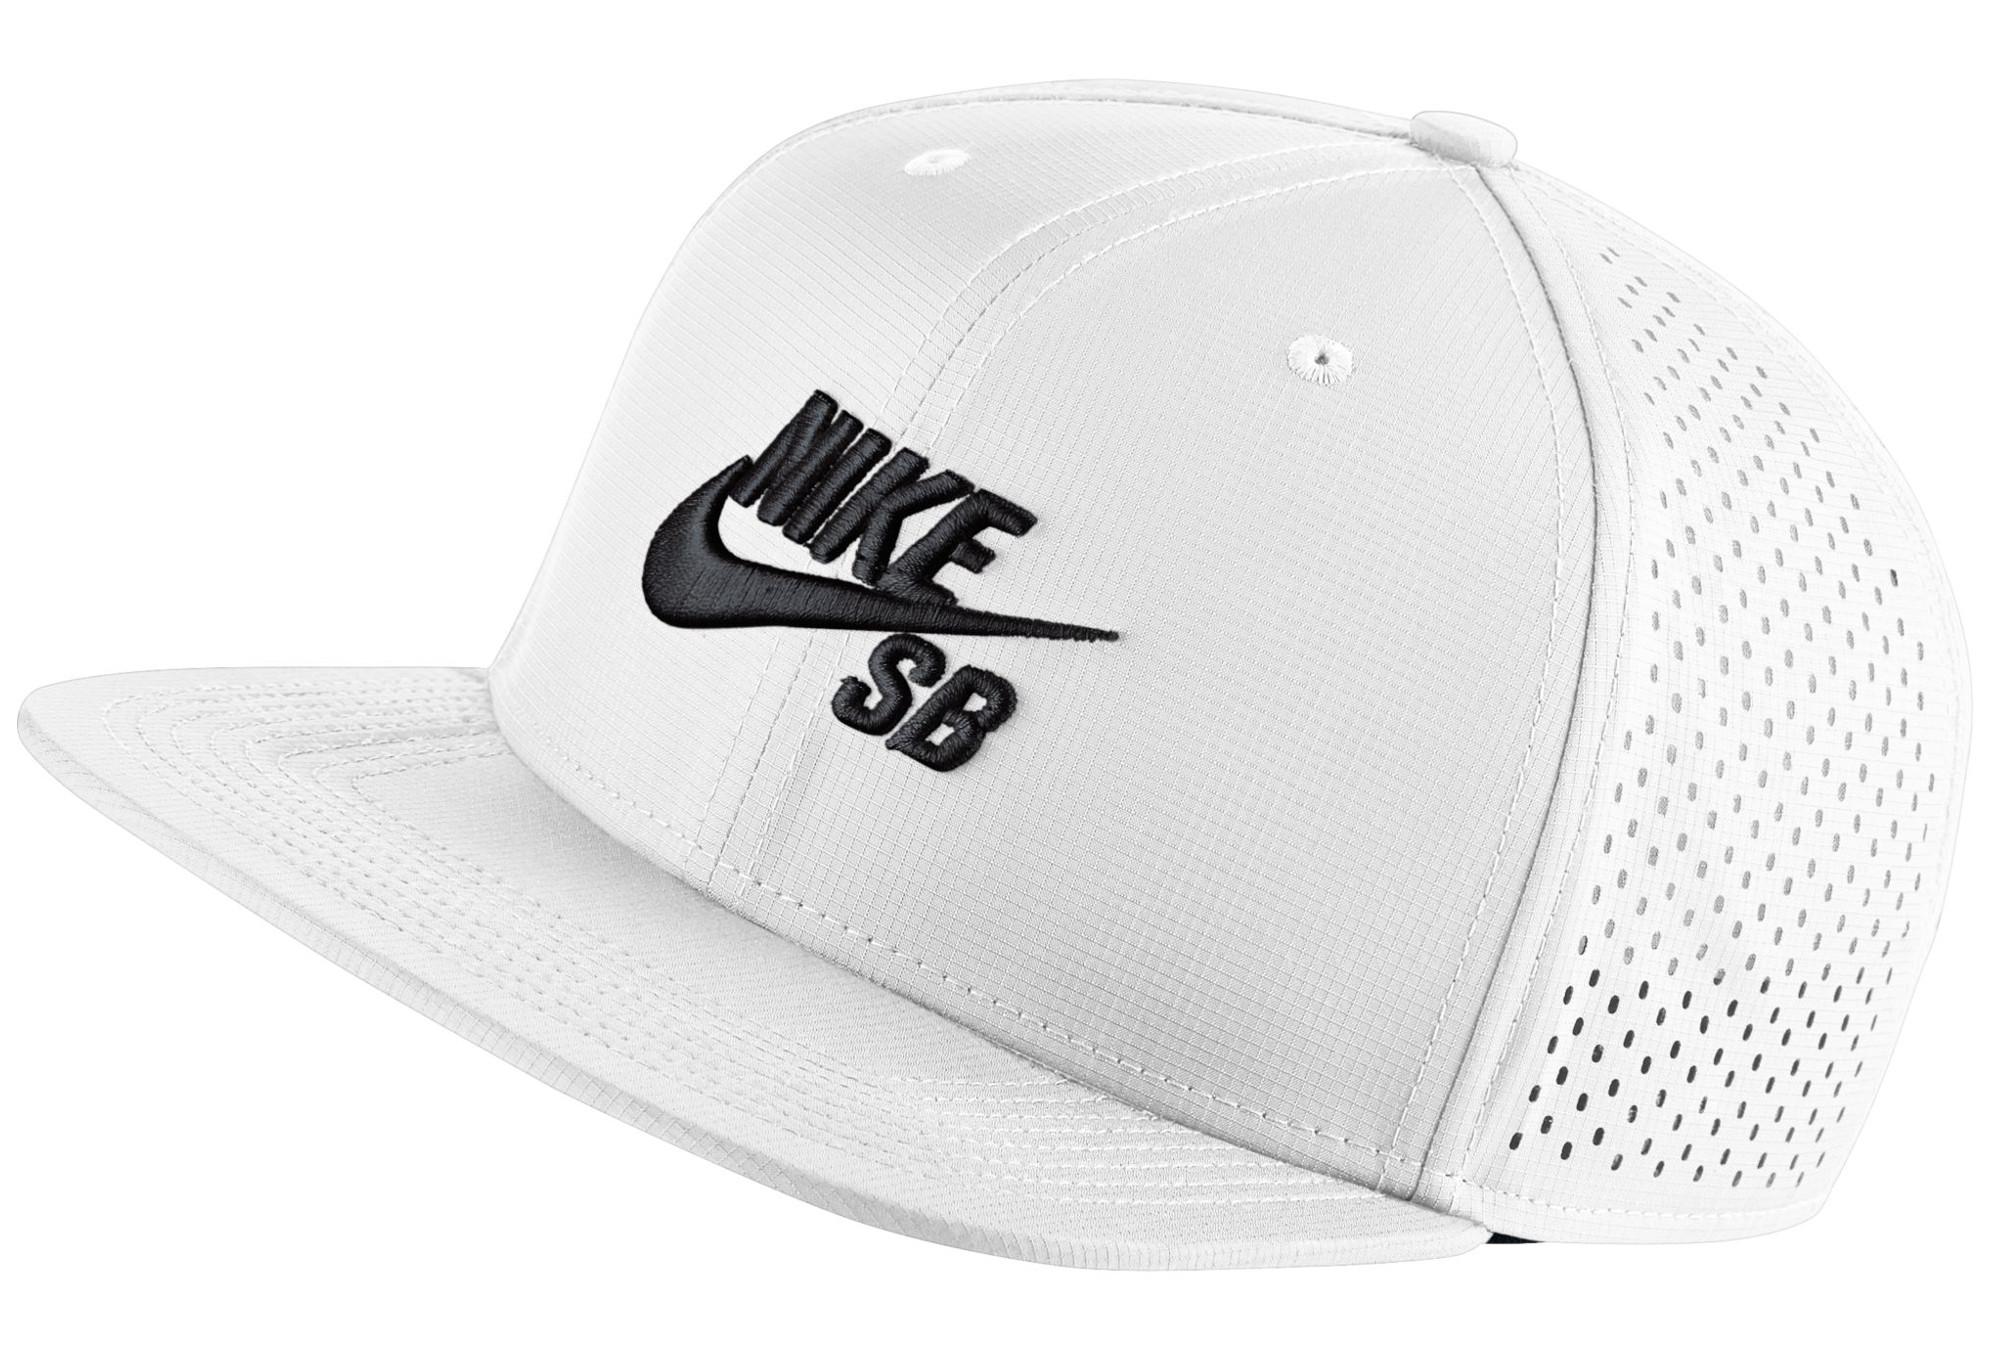 Casquette Nike SB Aerobill Blanc / Noir